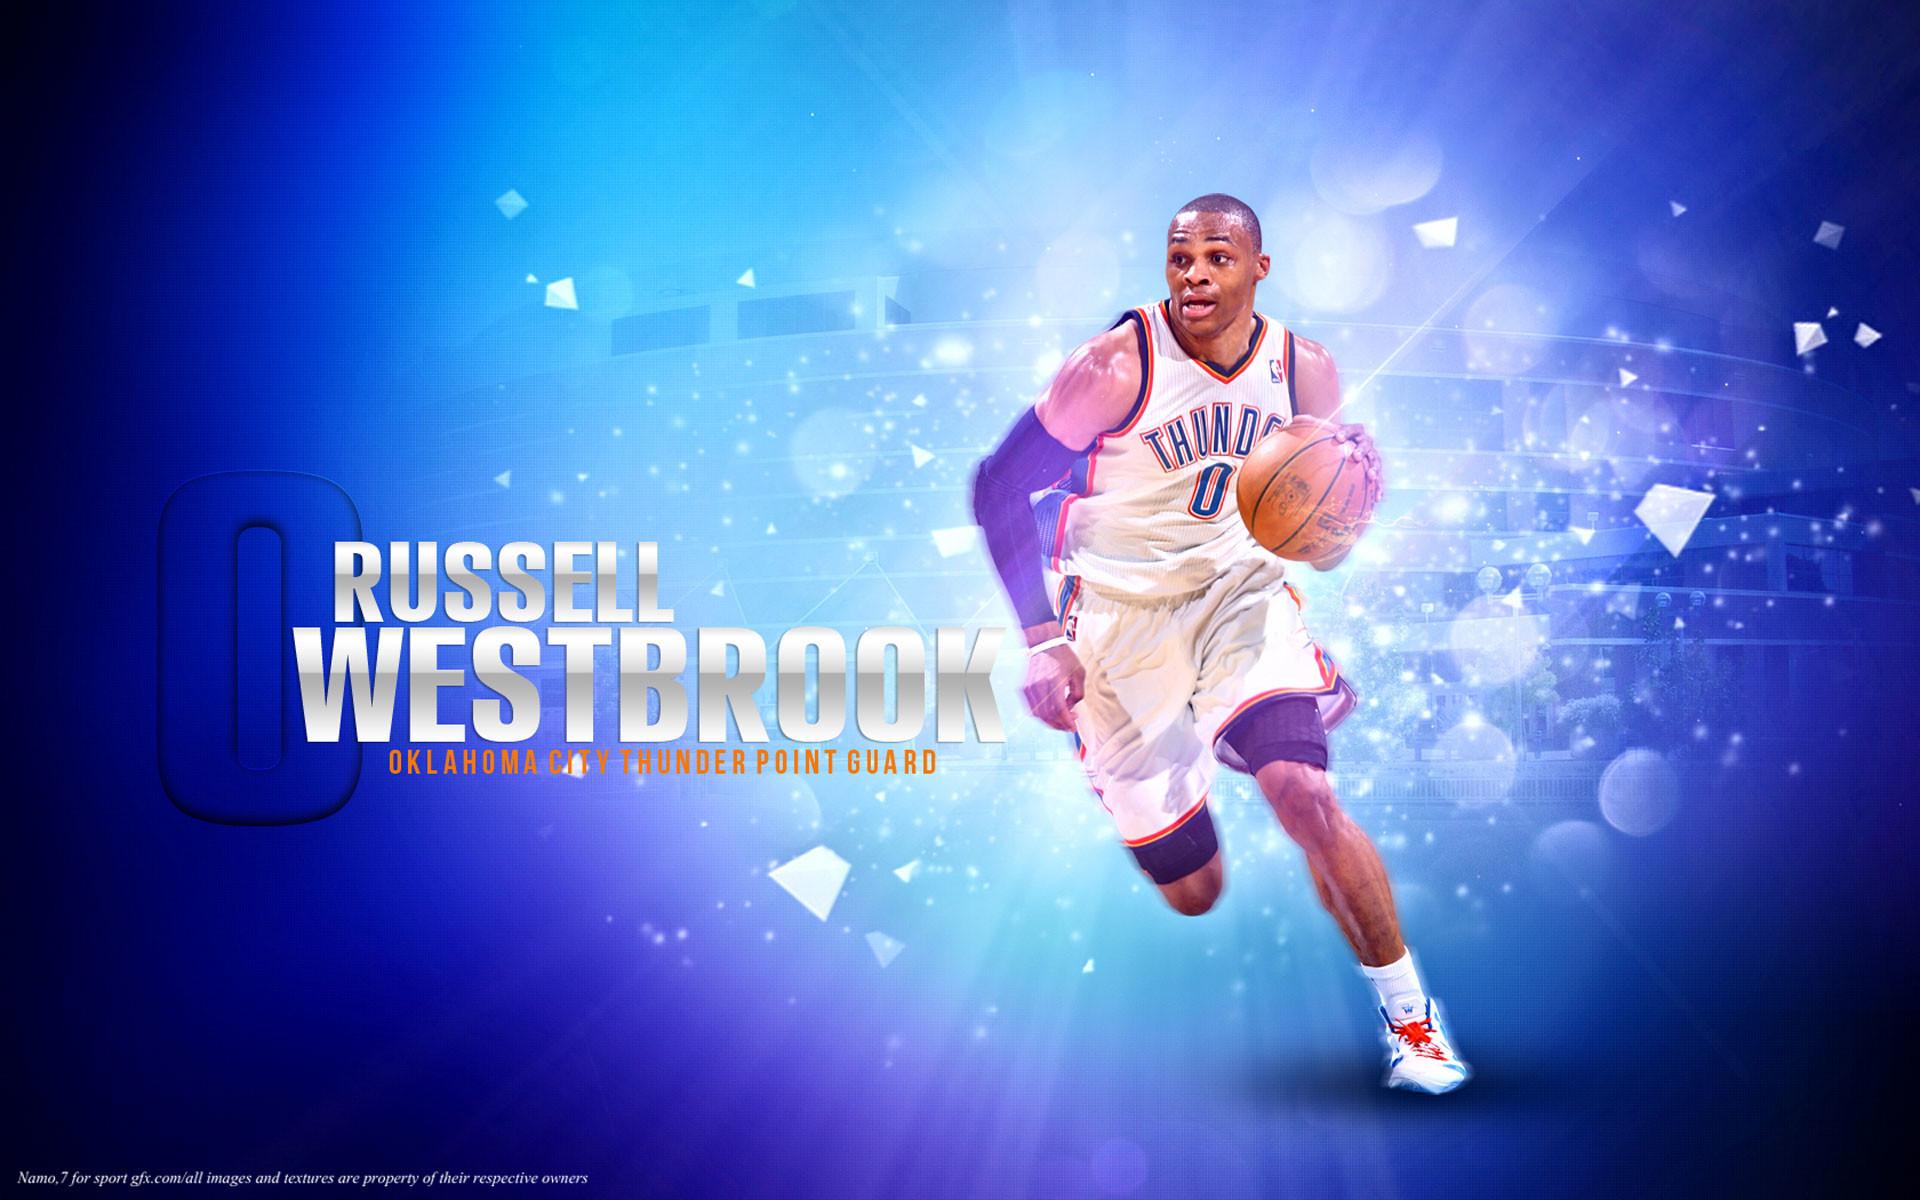 Russell Westbrook 2012-2013 Wallpaper